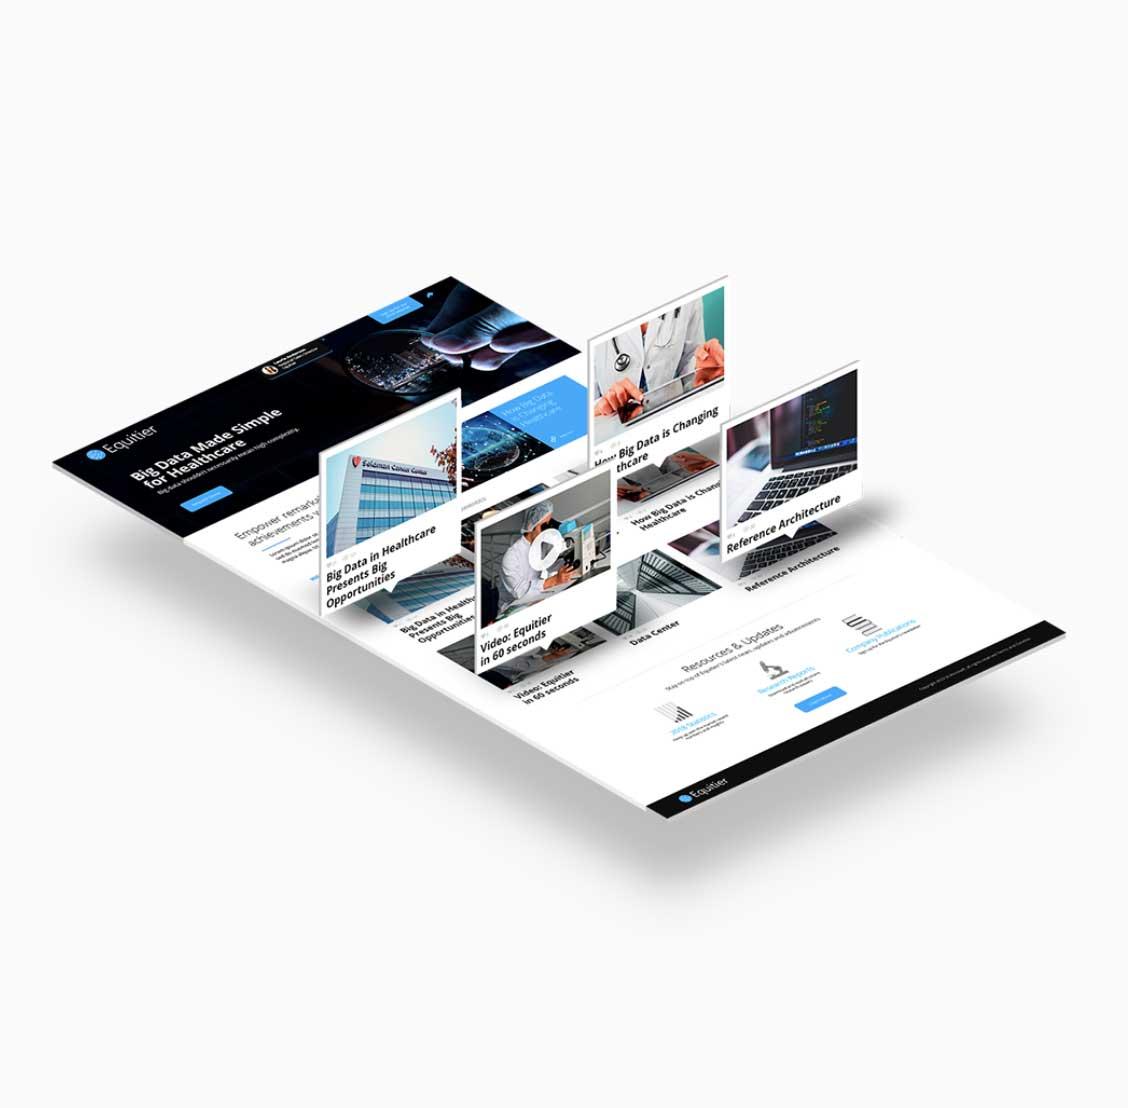 Next-generation personalized marketing platform.